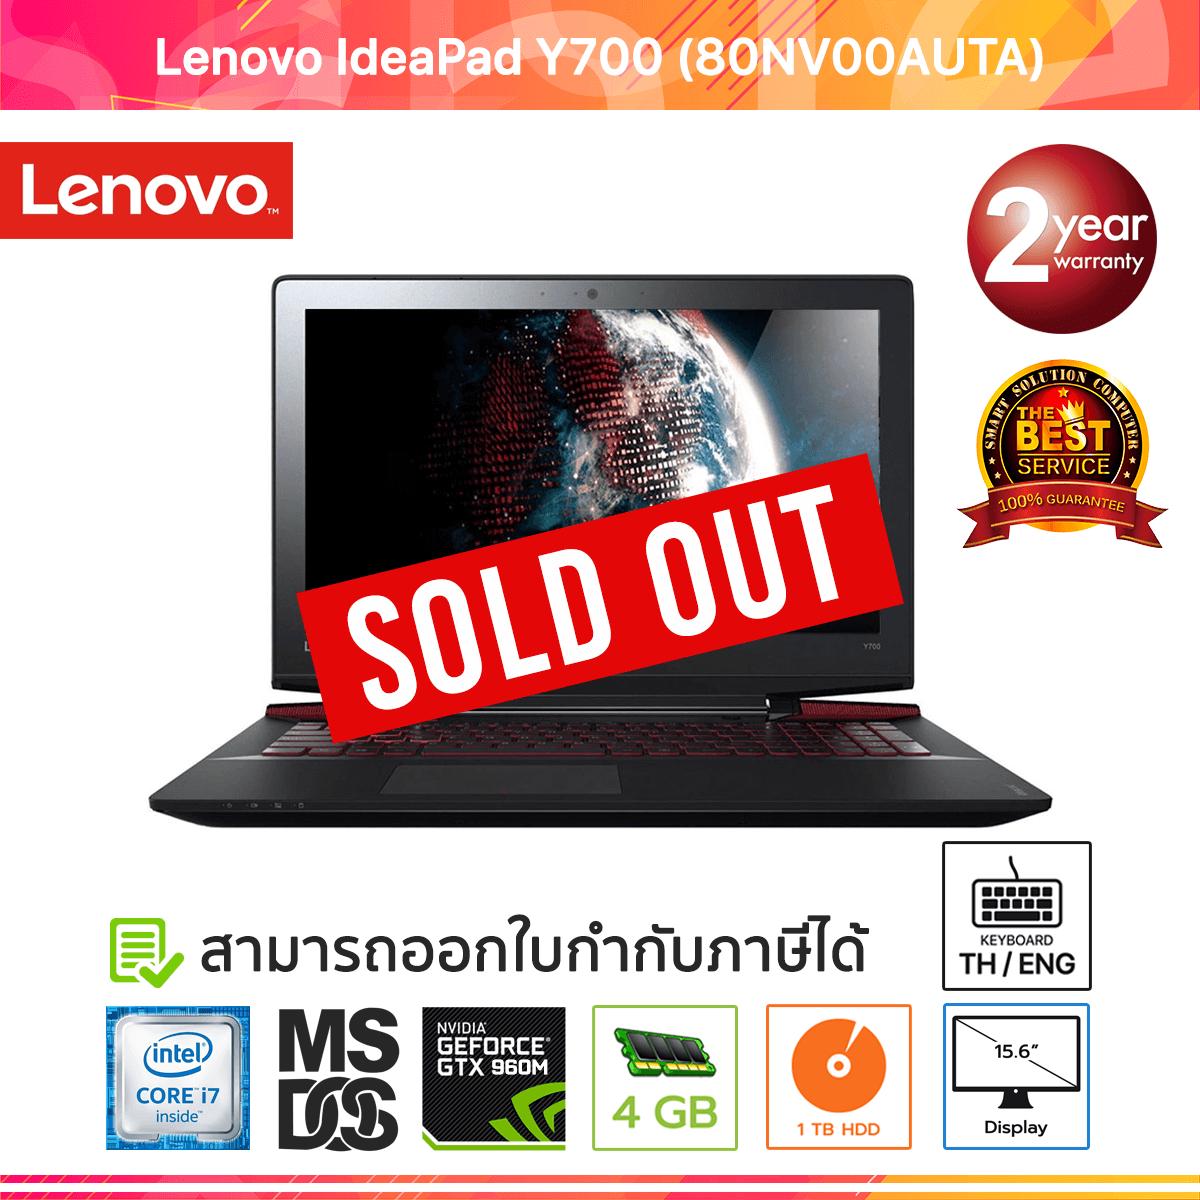 Lenovo IdeaPad Y700 (80NV00AUTA) Core i7-6700HQ 4GB 1TB GTX 960M Dos 15.6